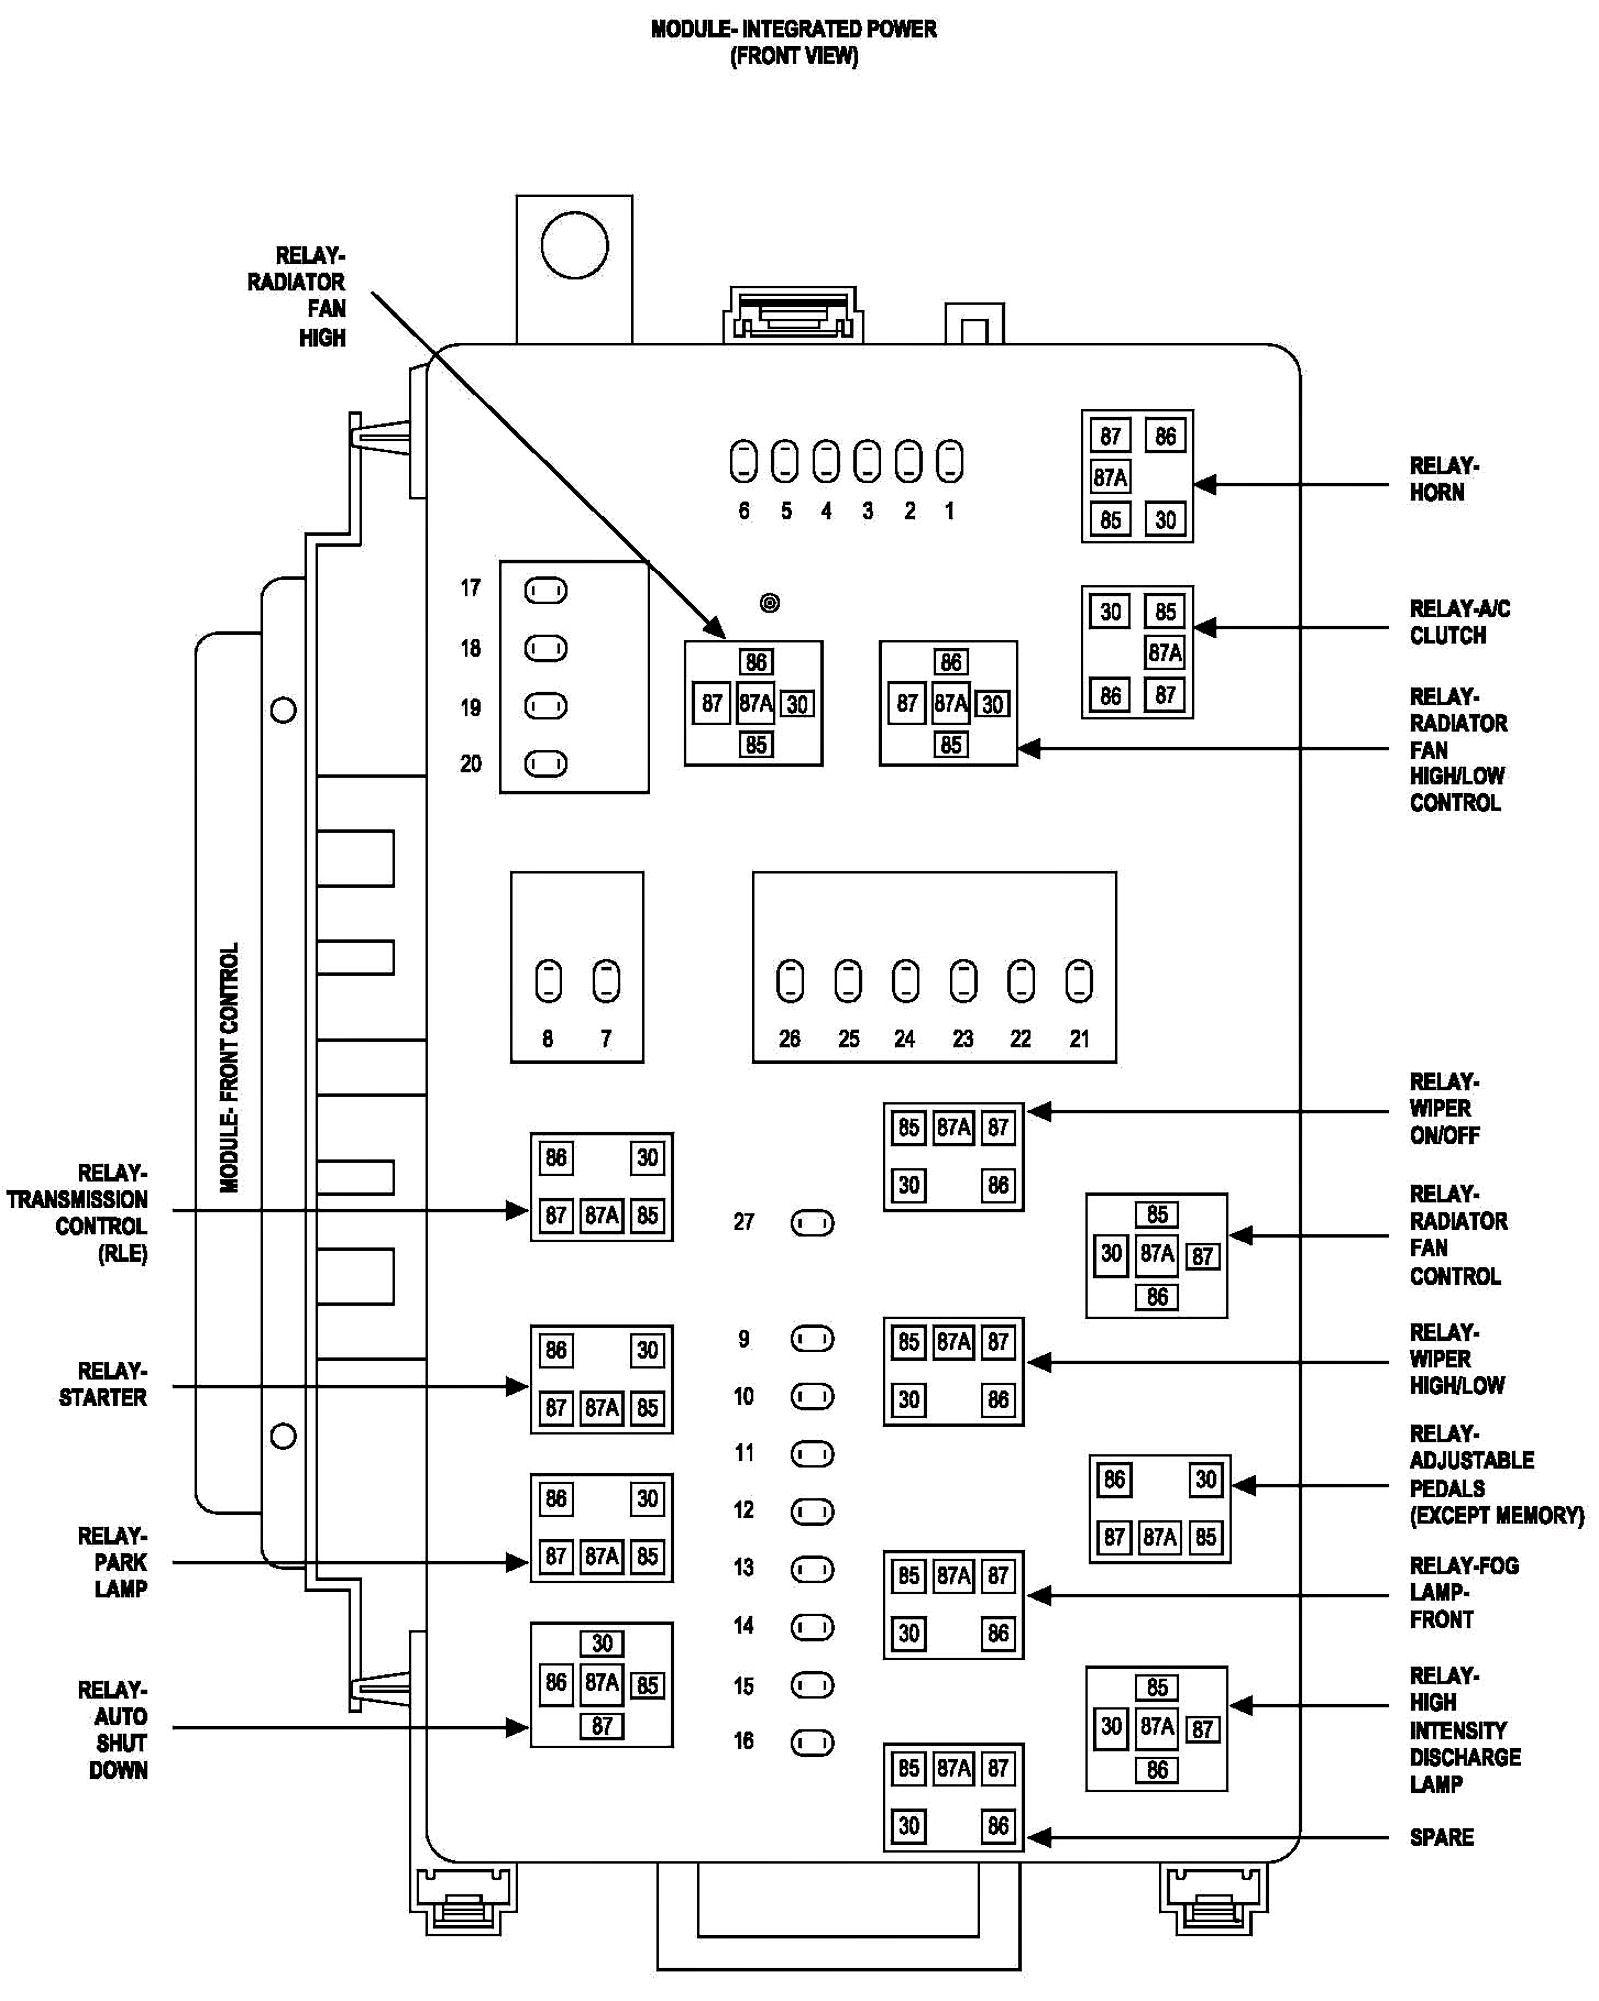 graphic Chrysler 300, Diagram, Radiator fan